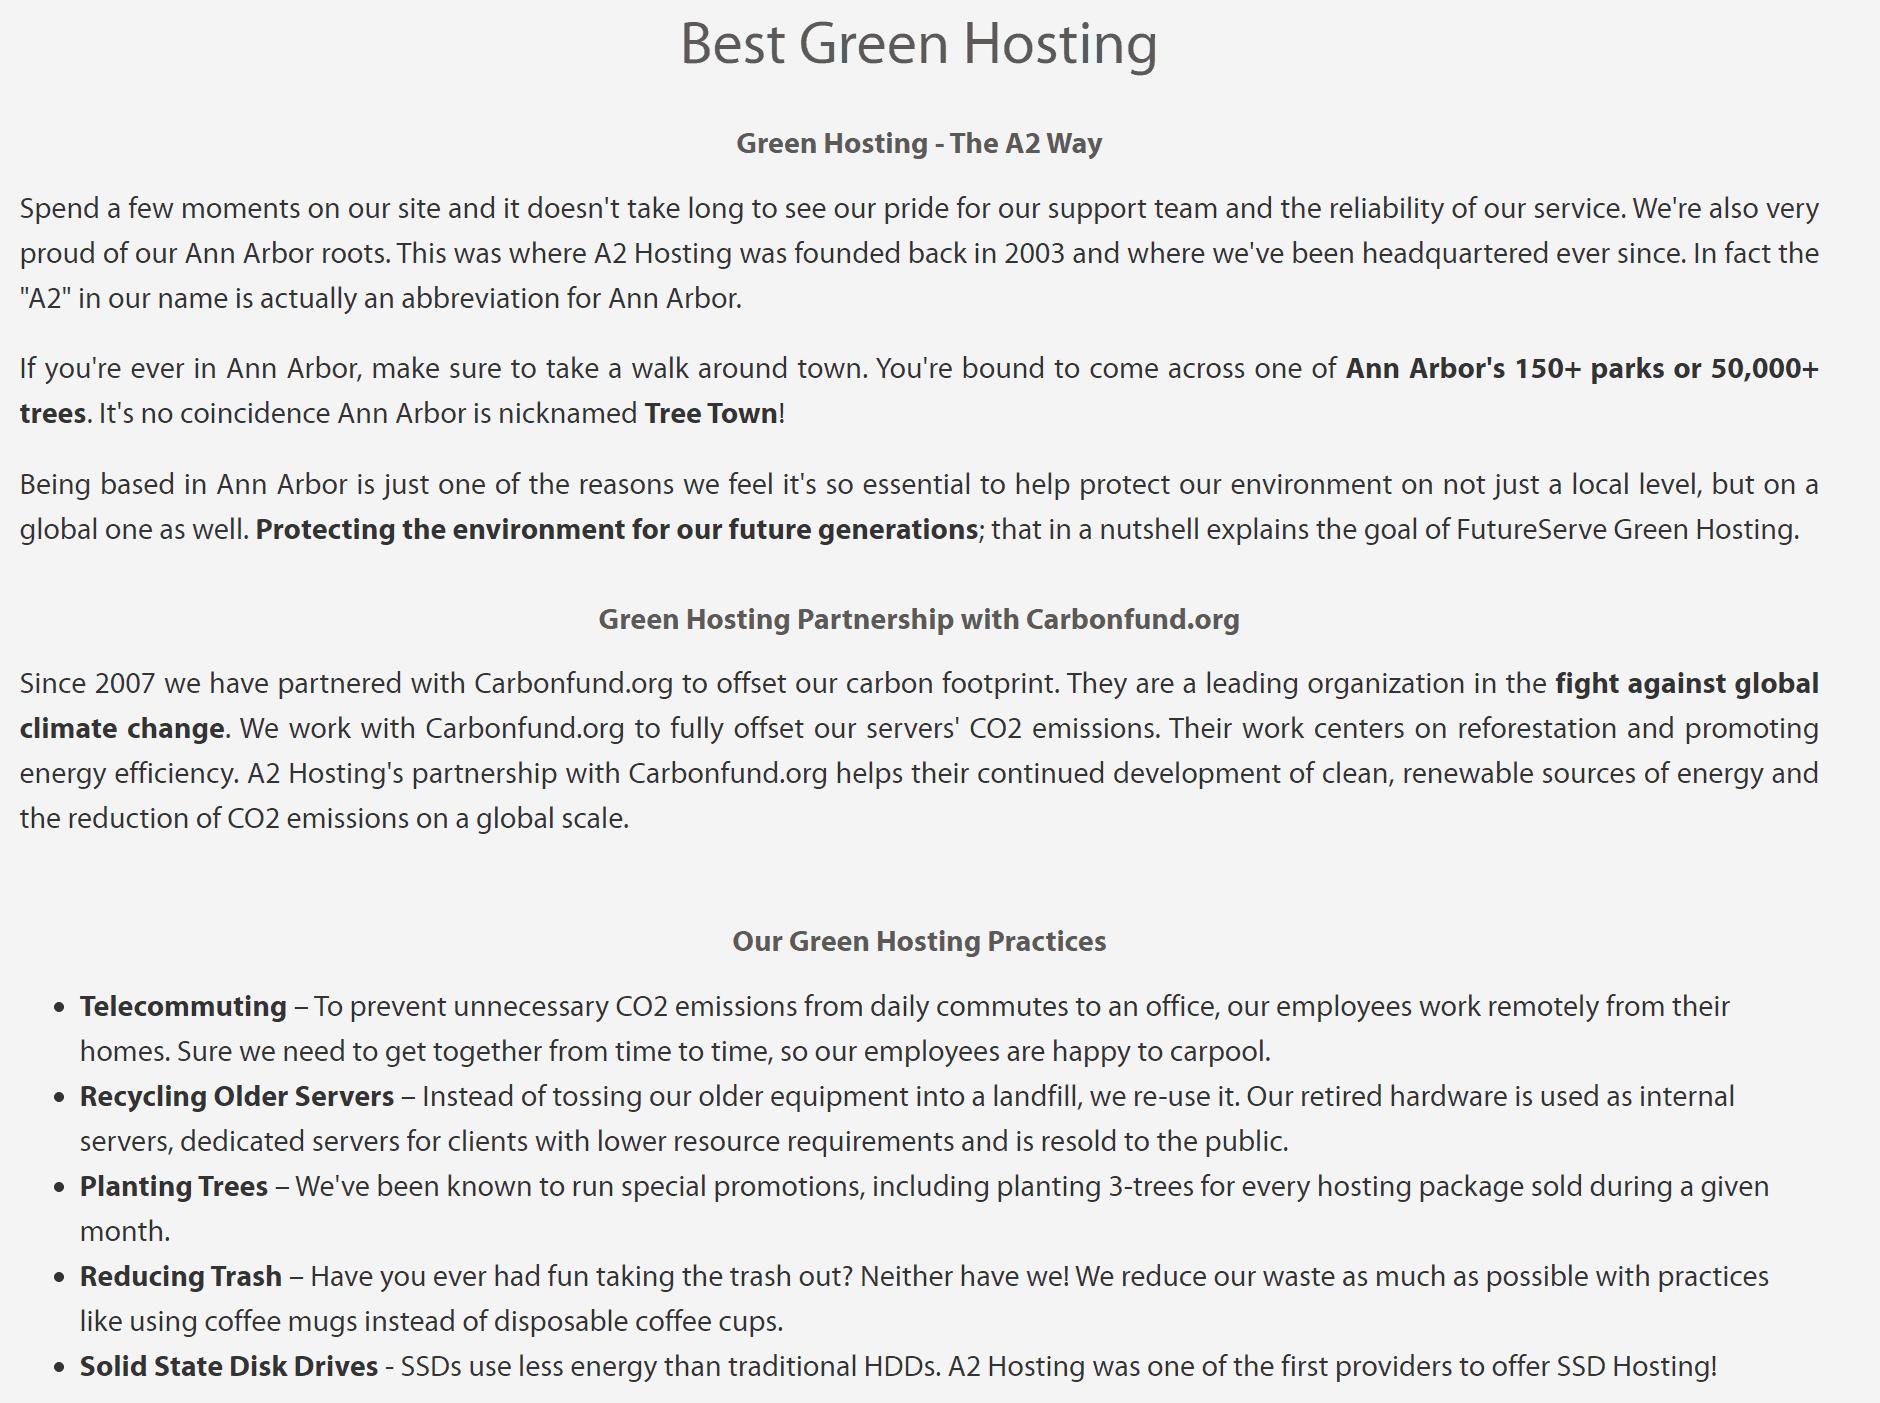 A2 Hosting green hosting